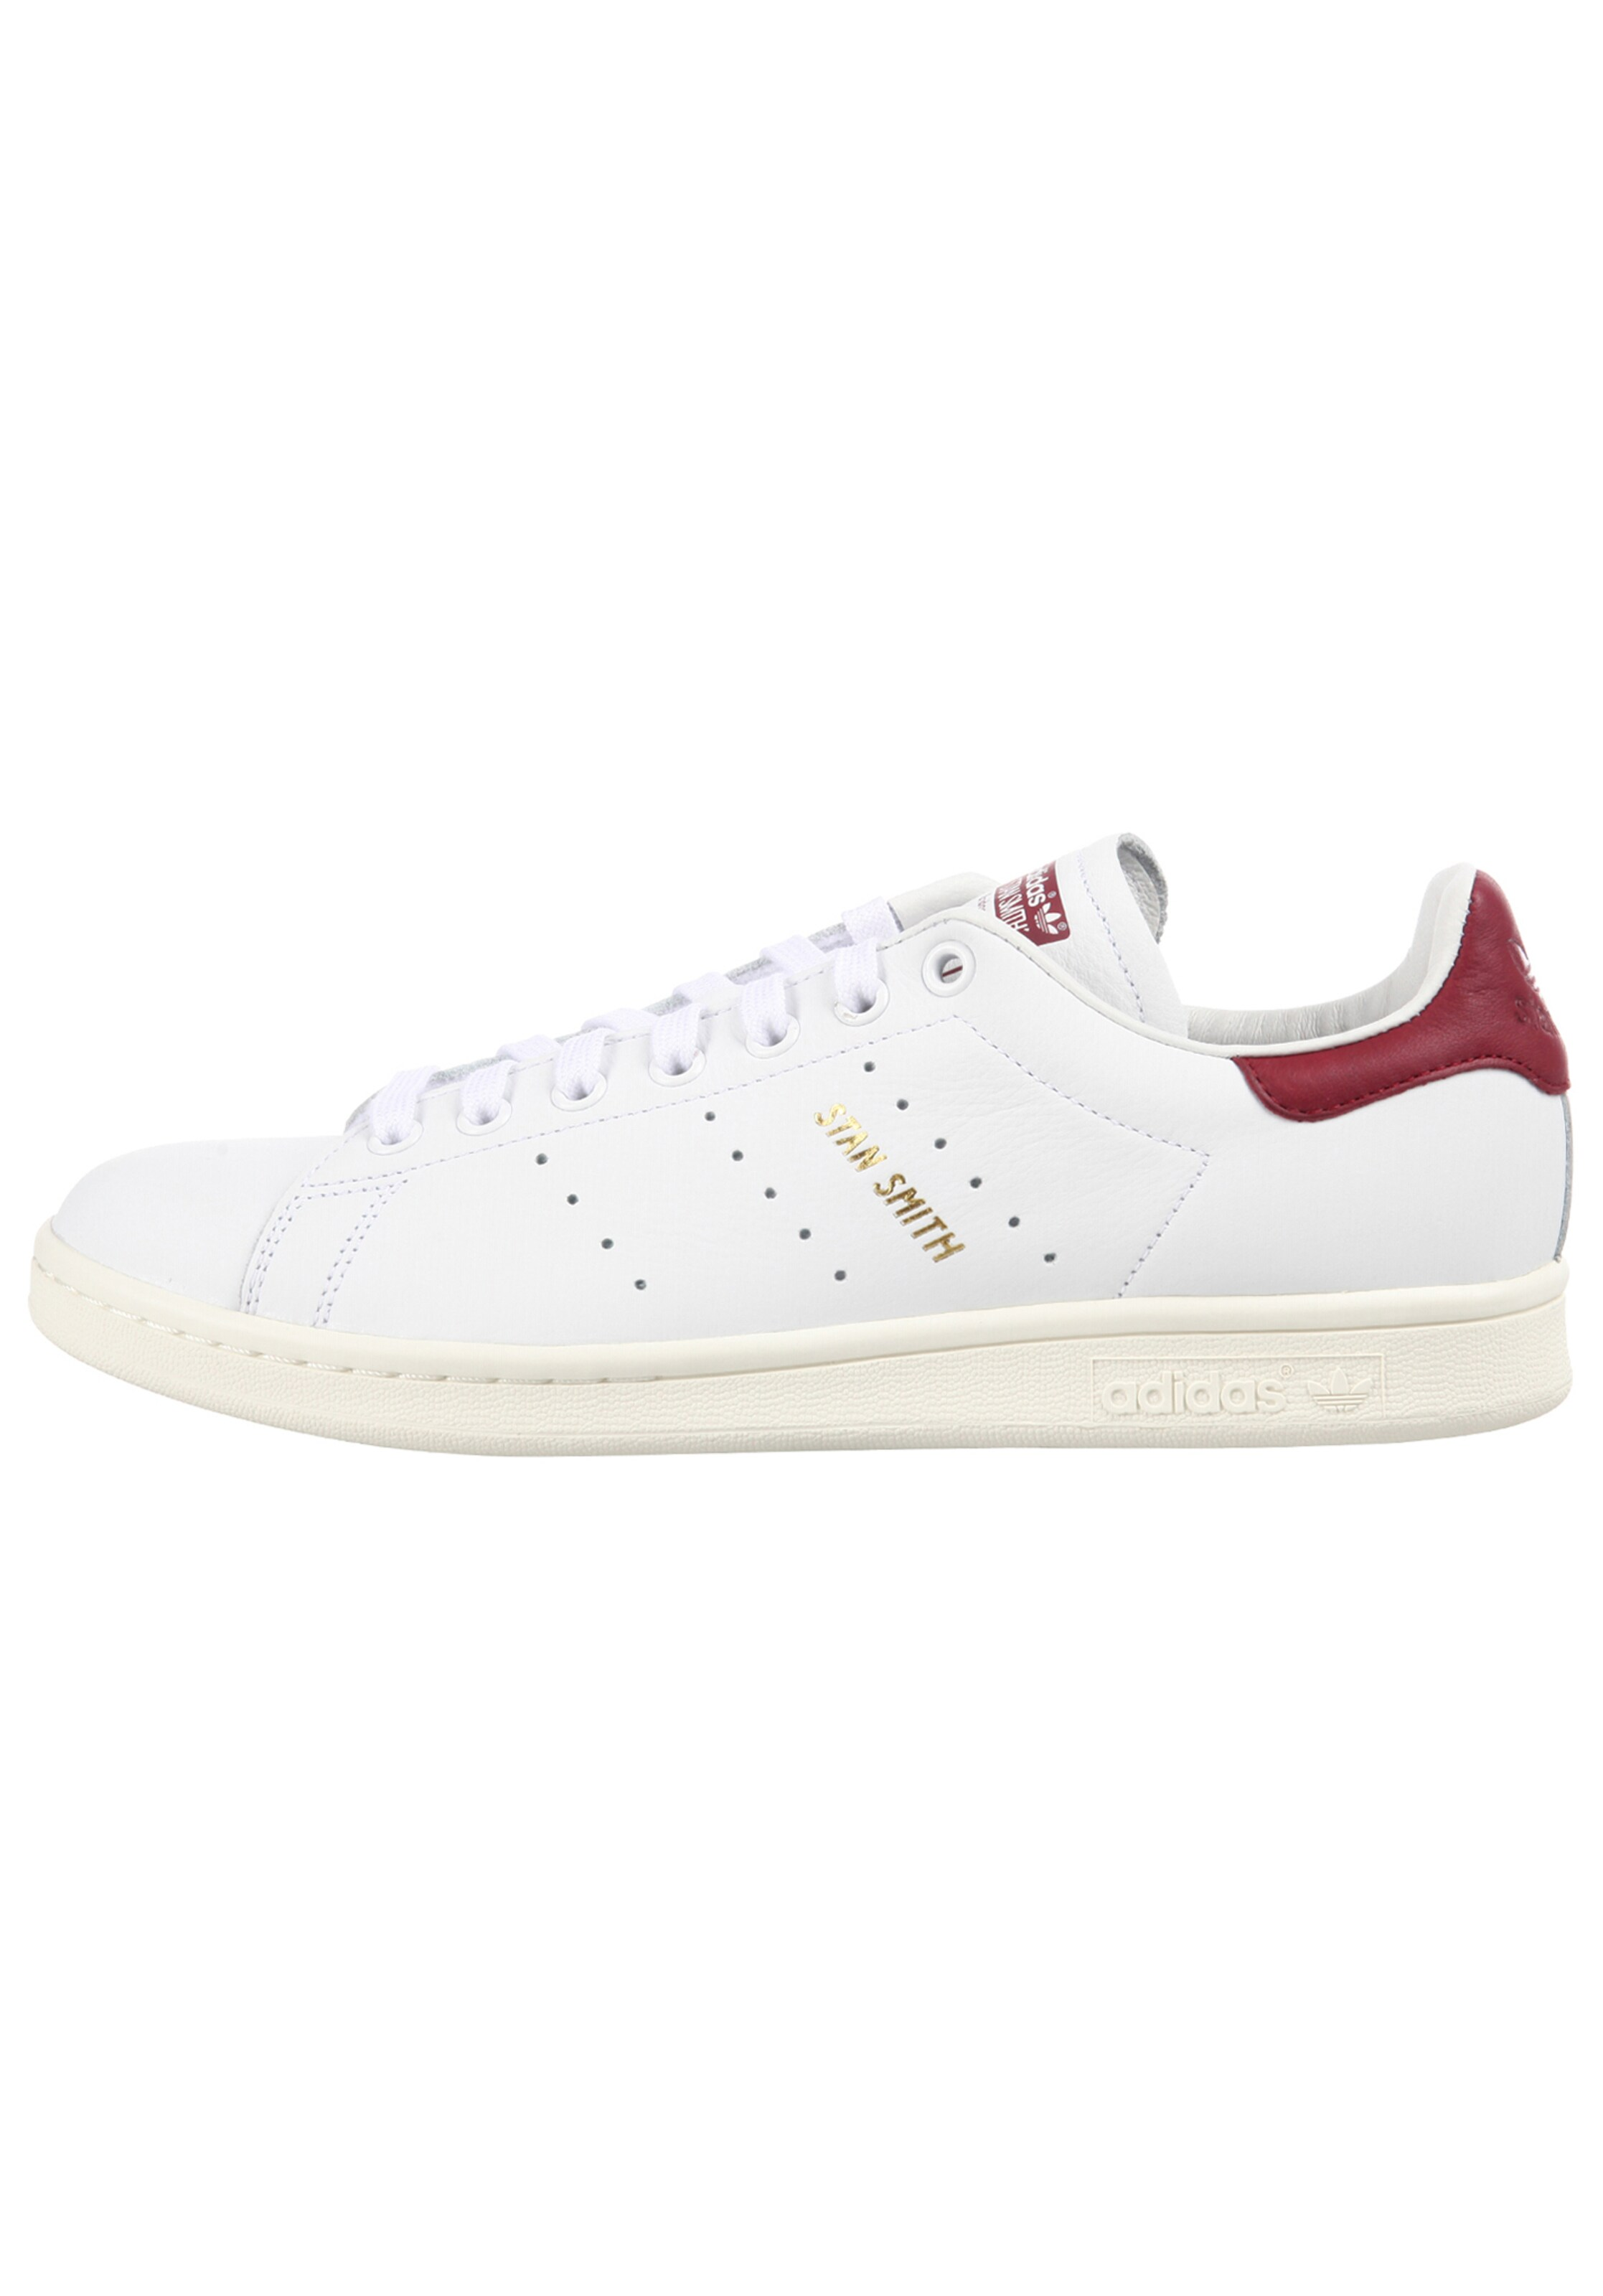 ADIDAS ORIGINALS Stan Smith Sneaker Hohe Qualität